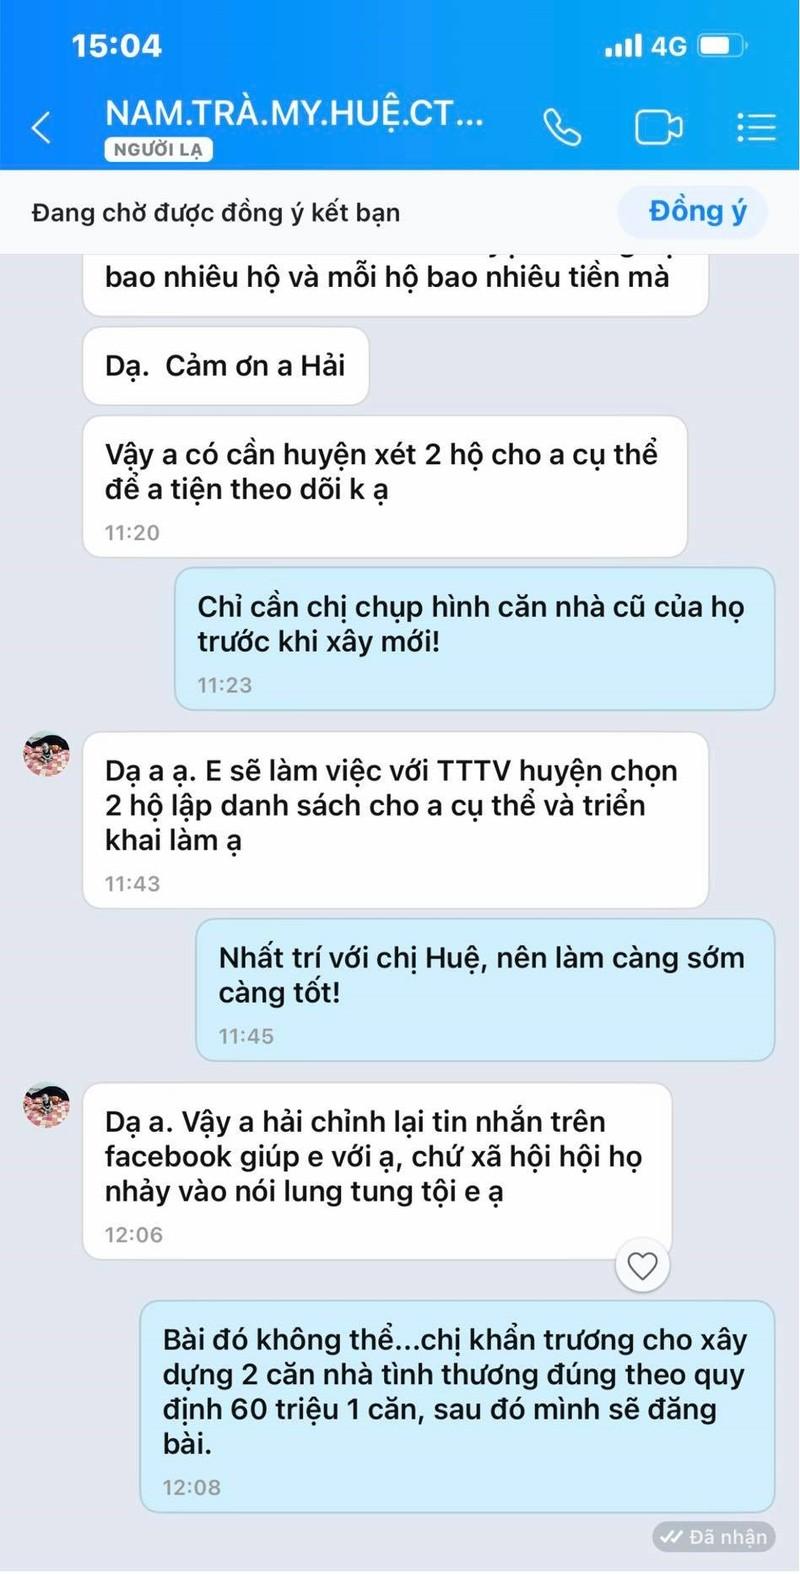 Doi lai 106 trieu dong ho tro nguoi ngheo: Ong Doan Ngoc Hai noi gi?-Hinh-3